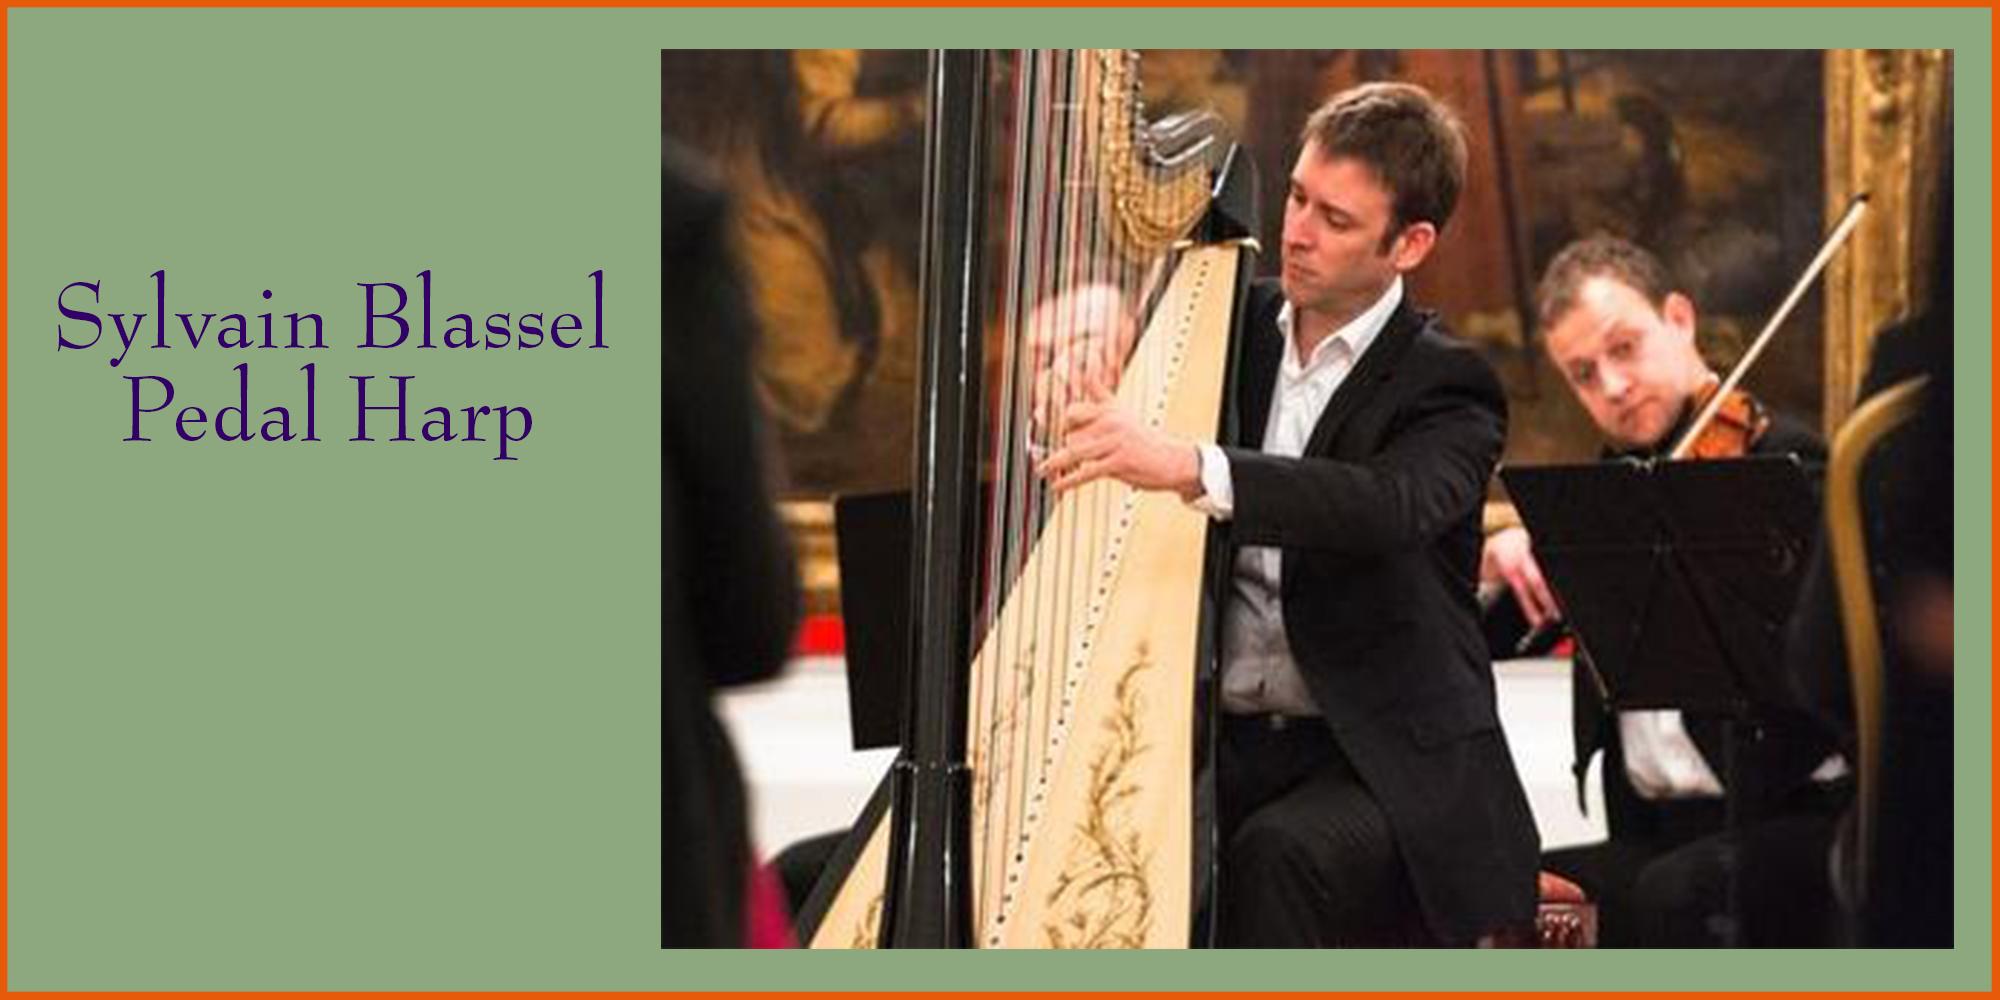 Sylvain Blassel on Pedal Harp